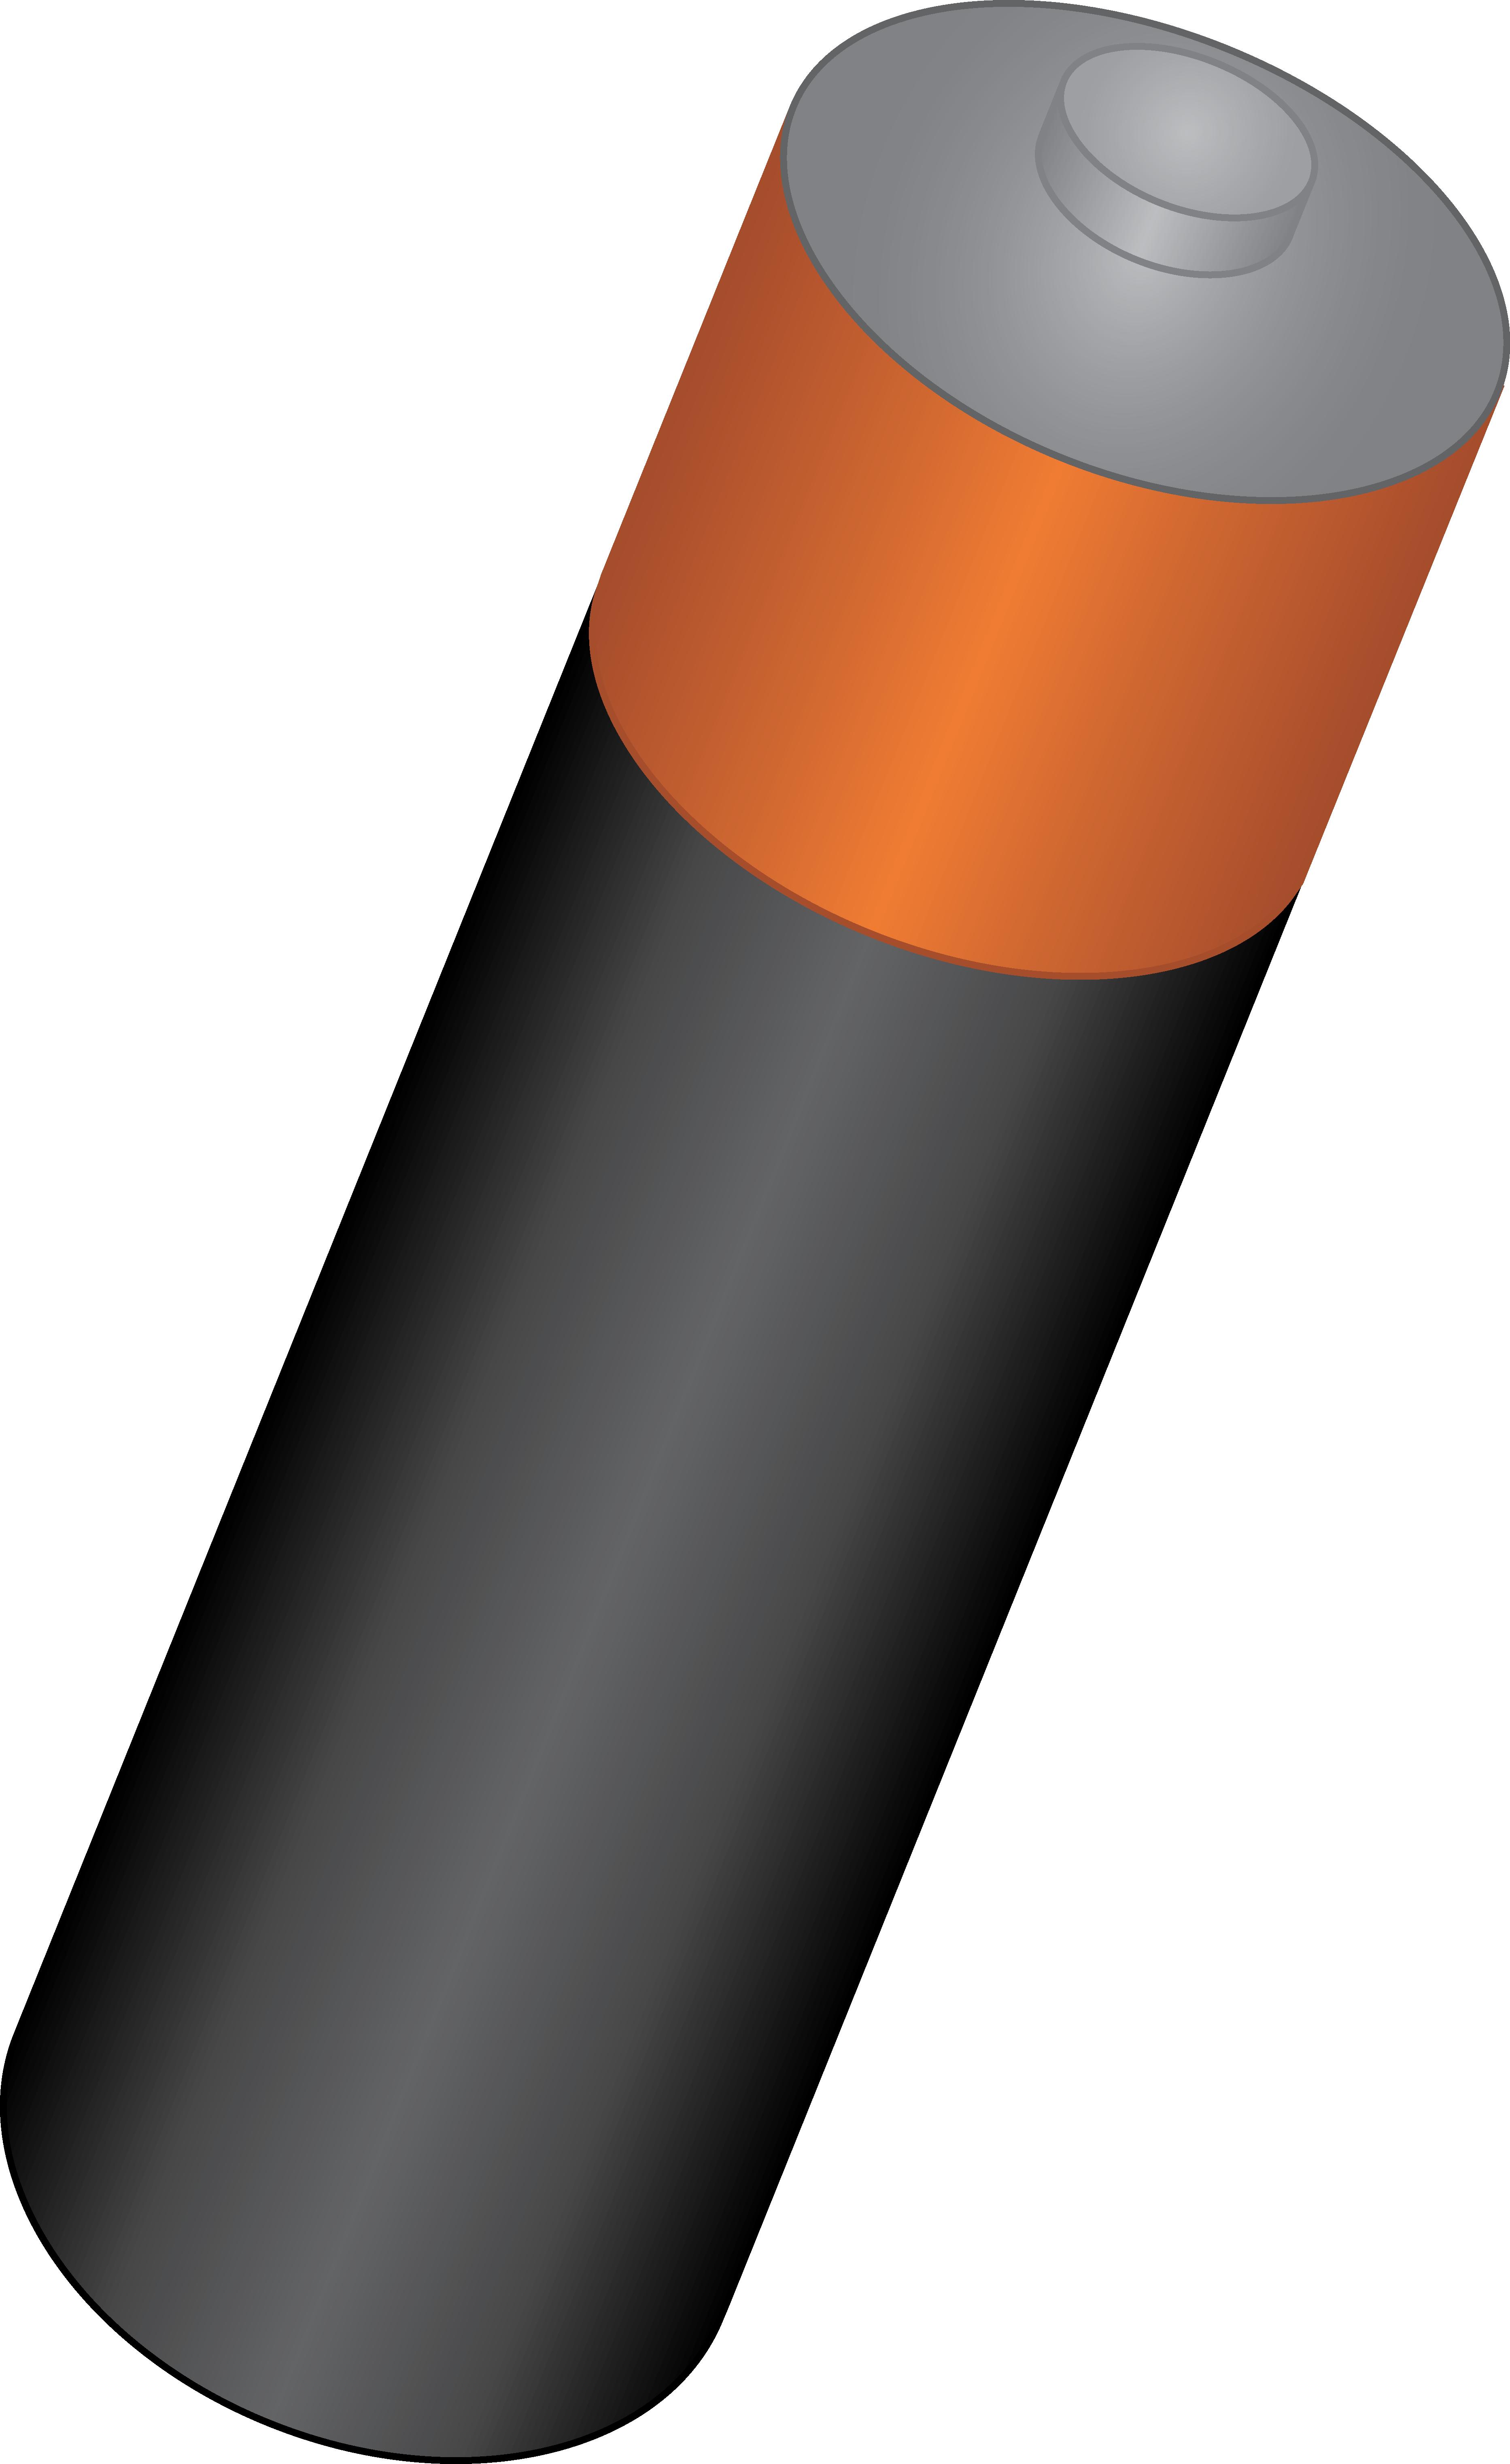 Single free clip art. Battery clipart aa battery